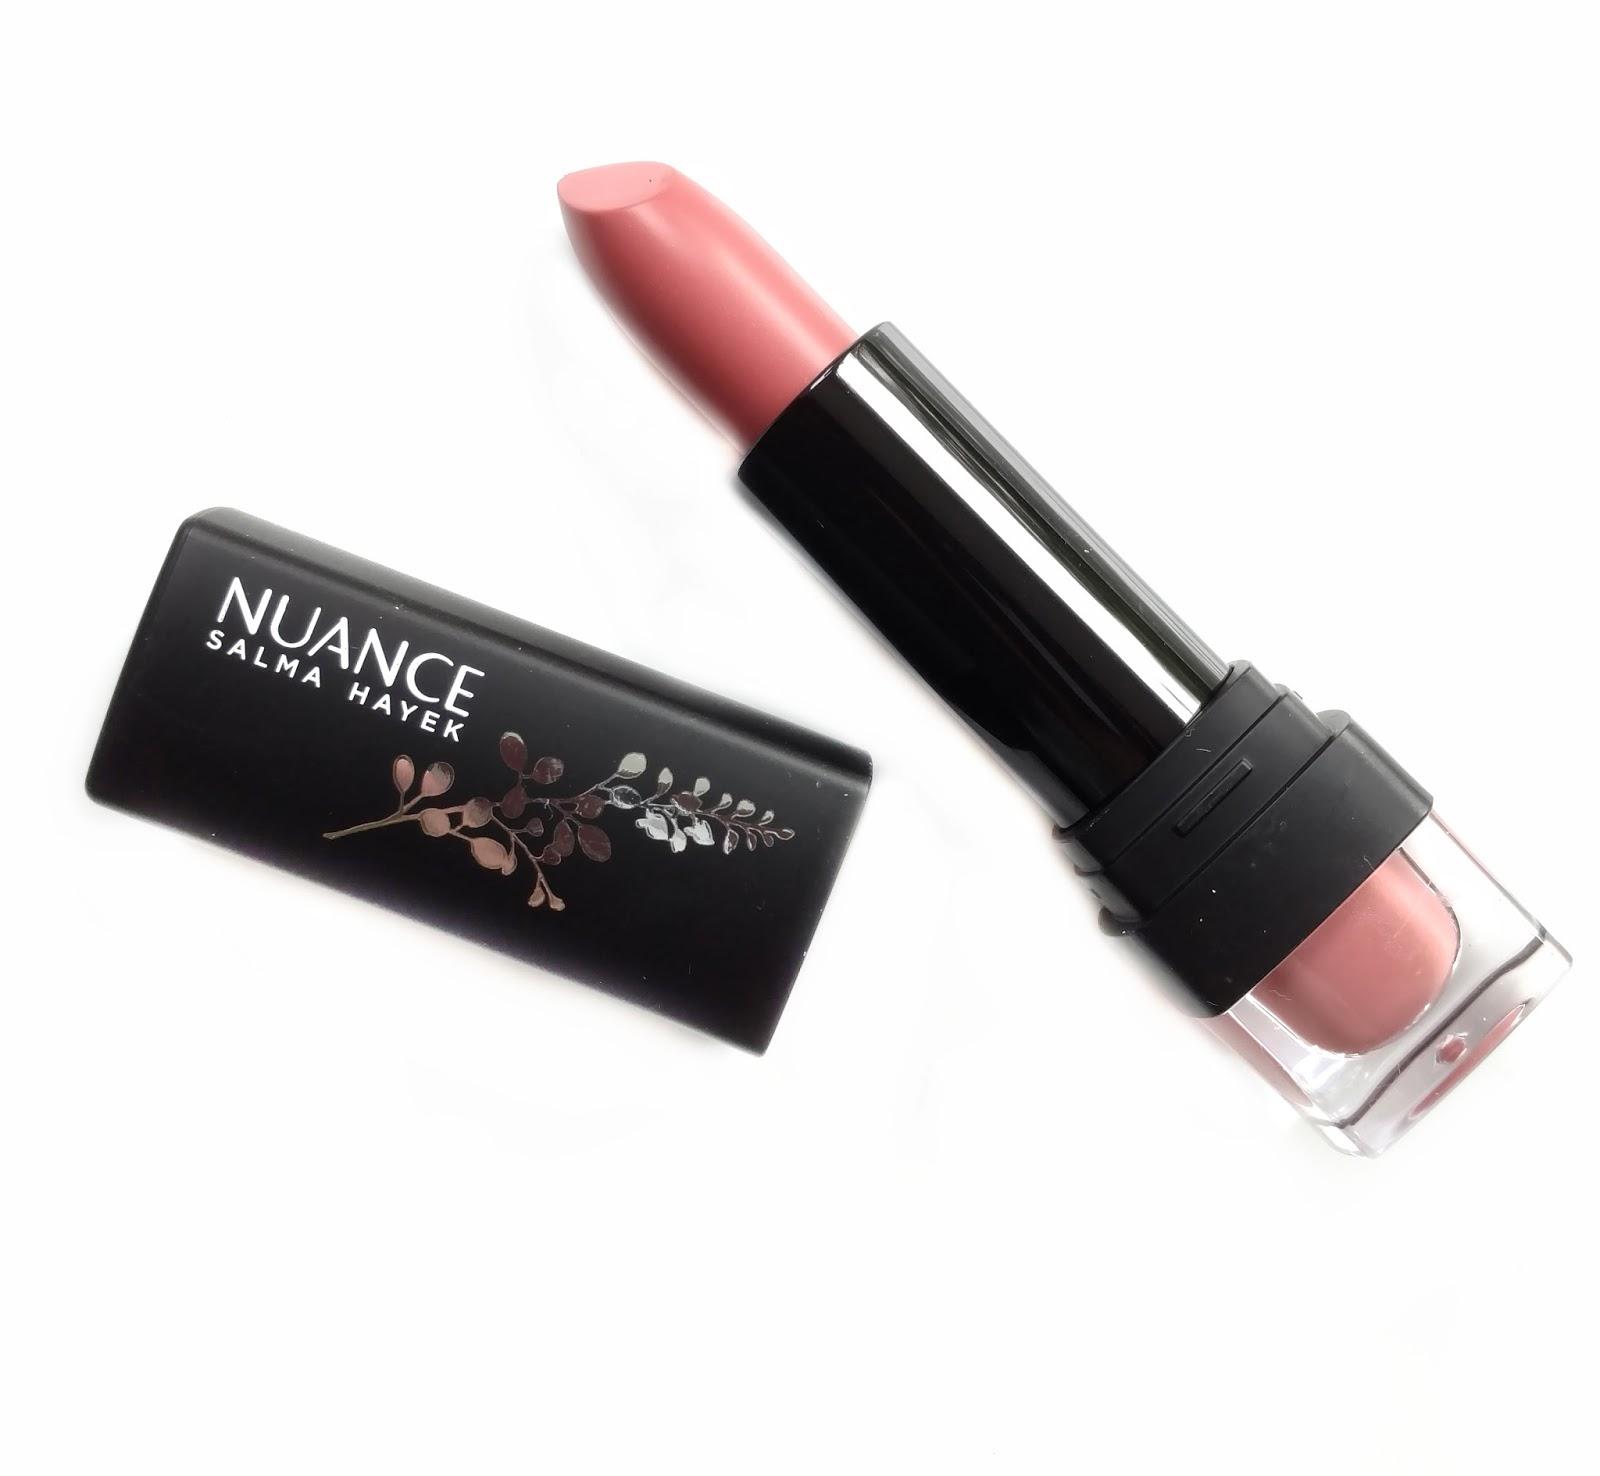 nuance salma hayek lipstick review